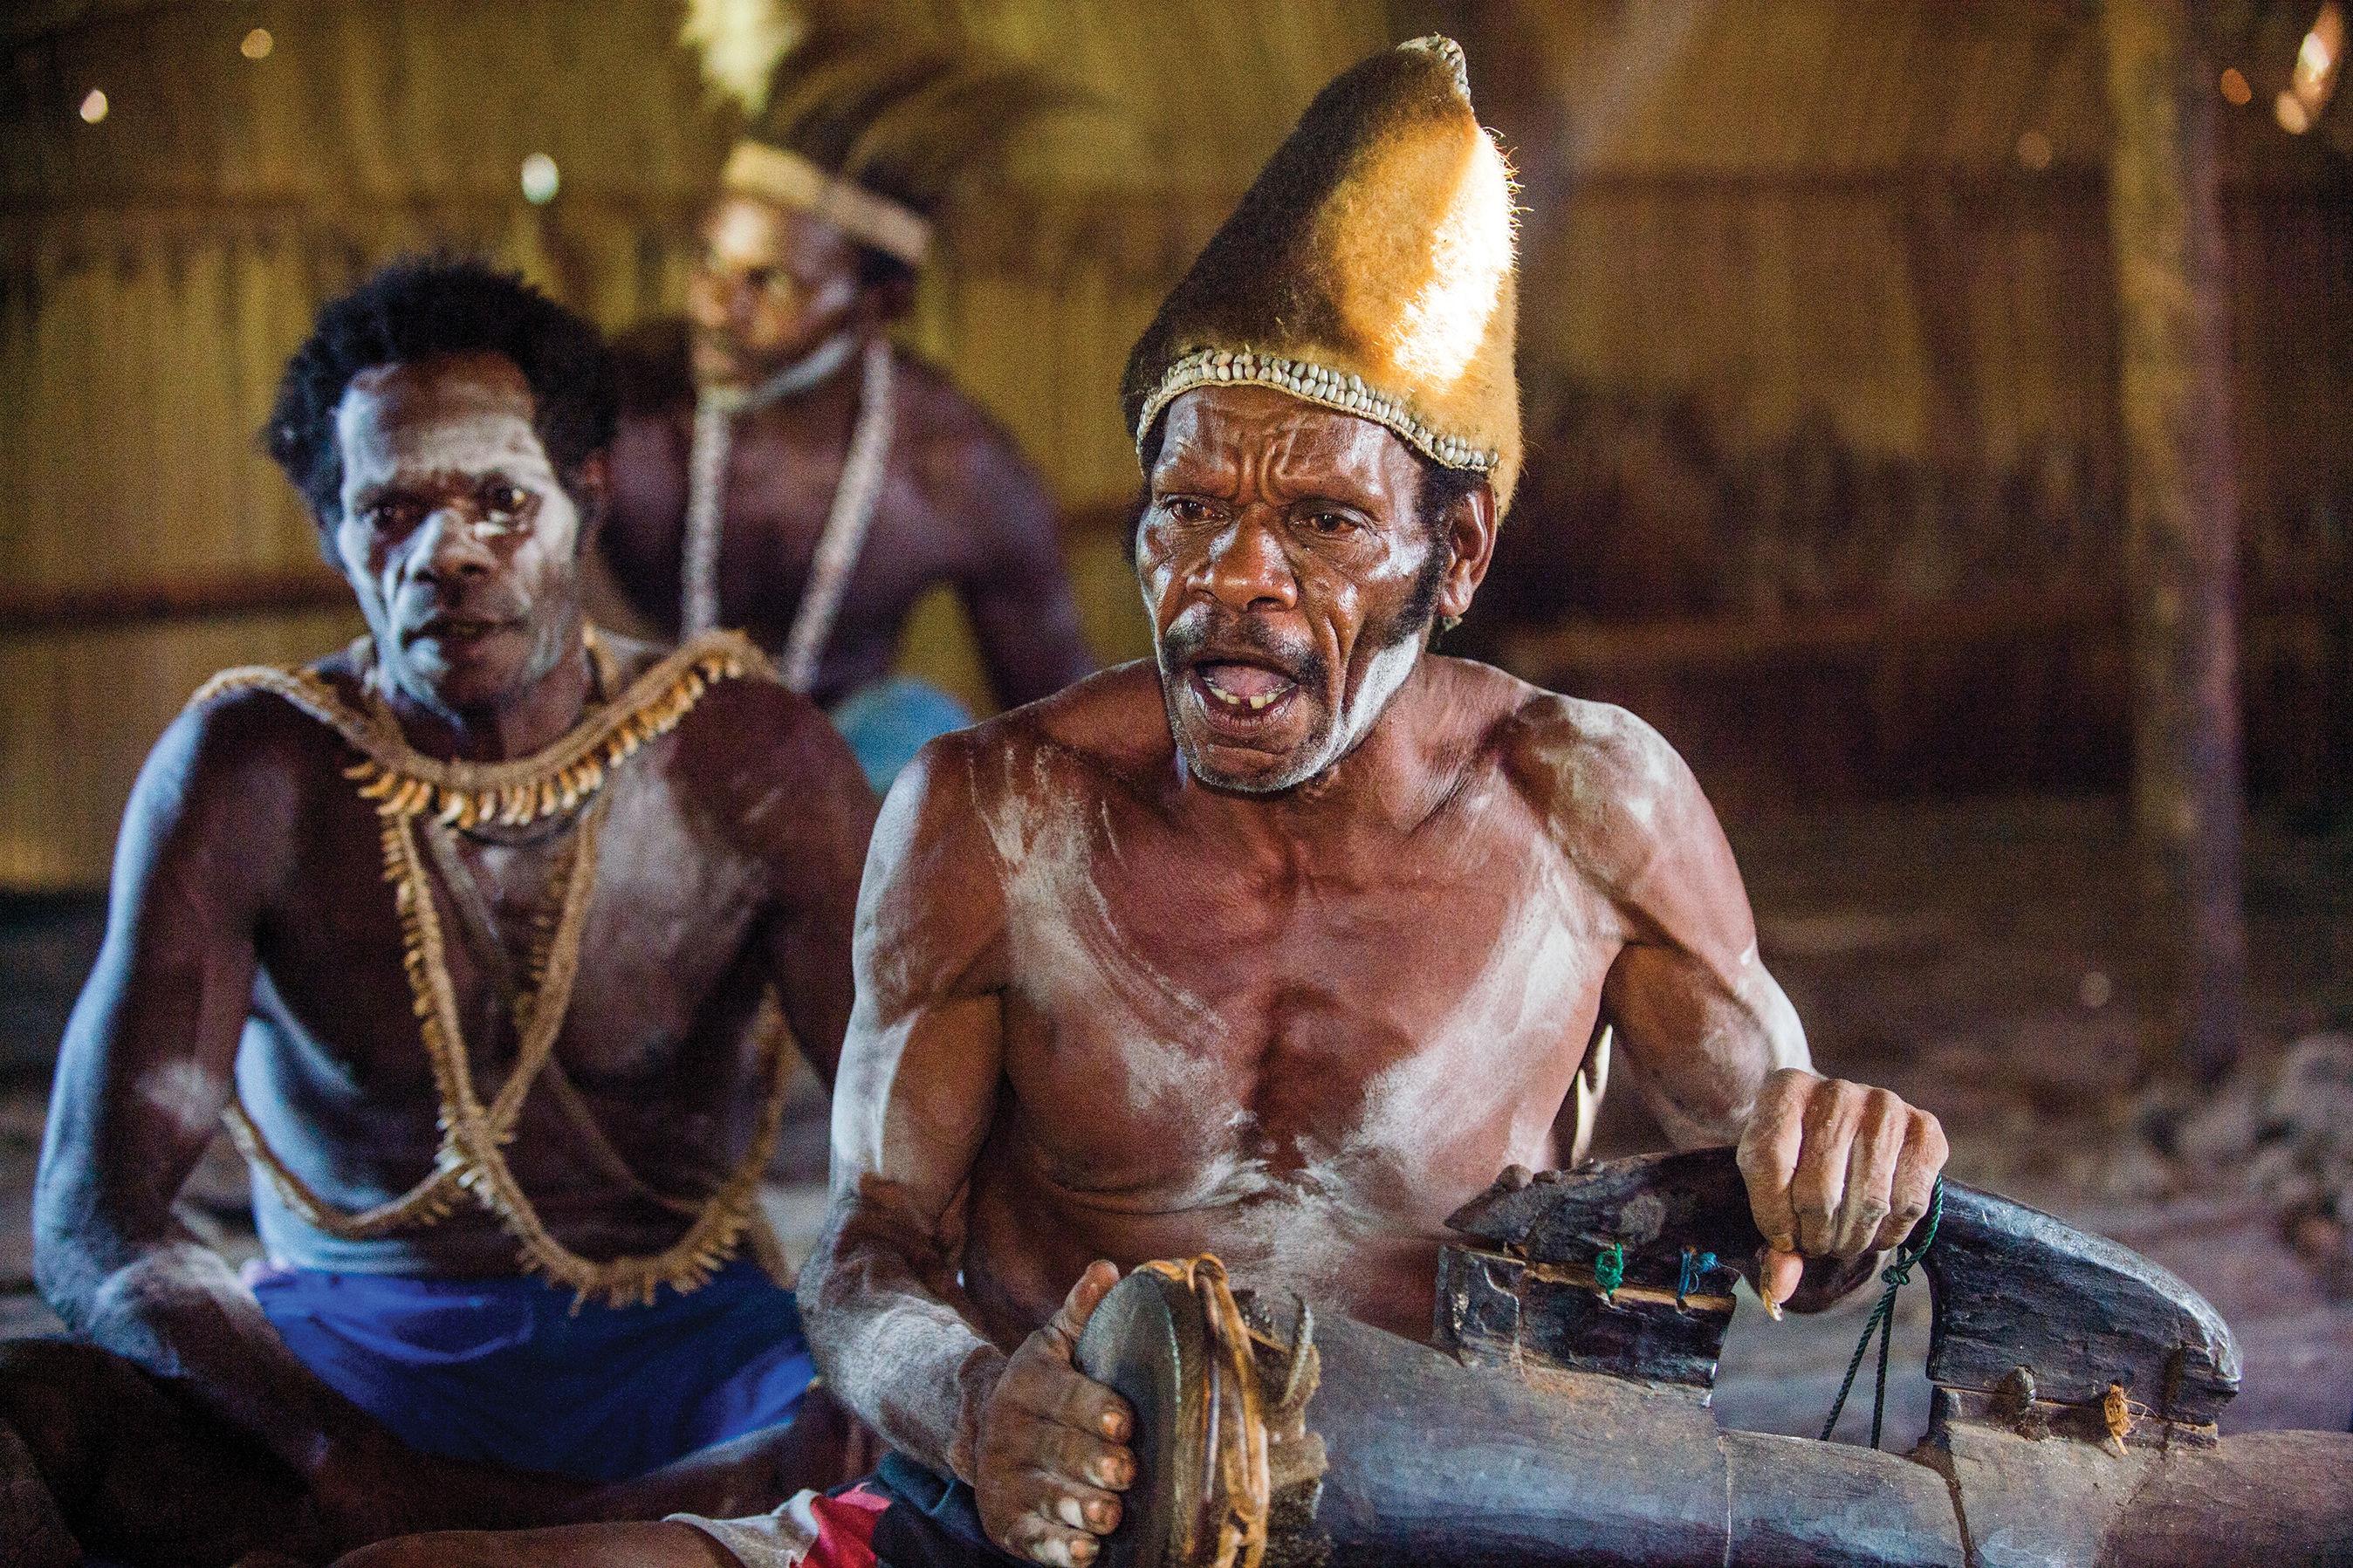 Jis 0217 travel indonesia asmat tribesman ys15xp